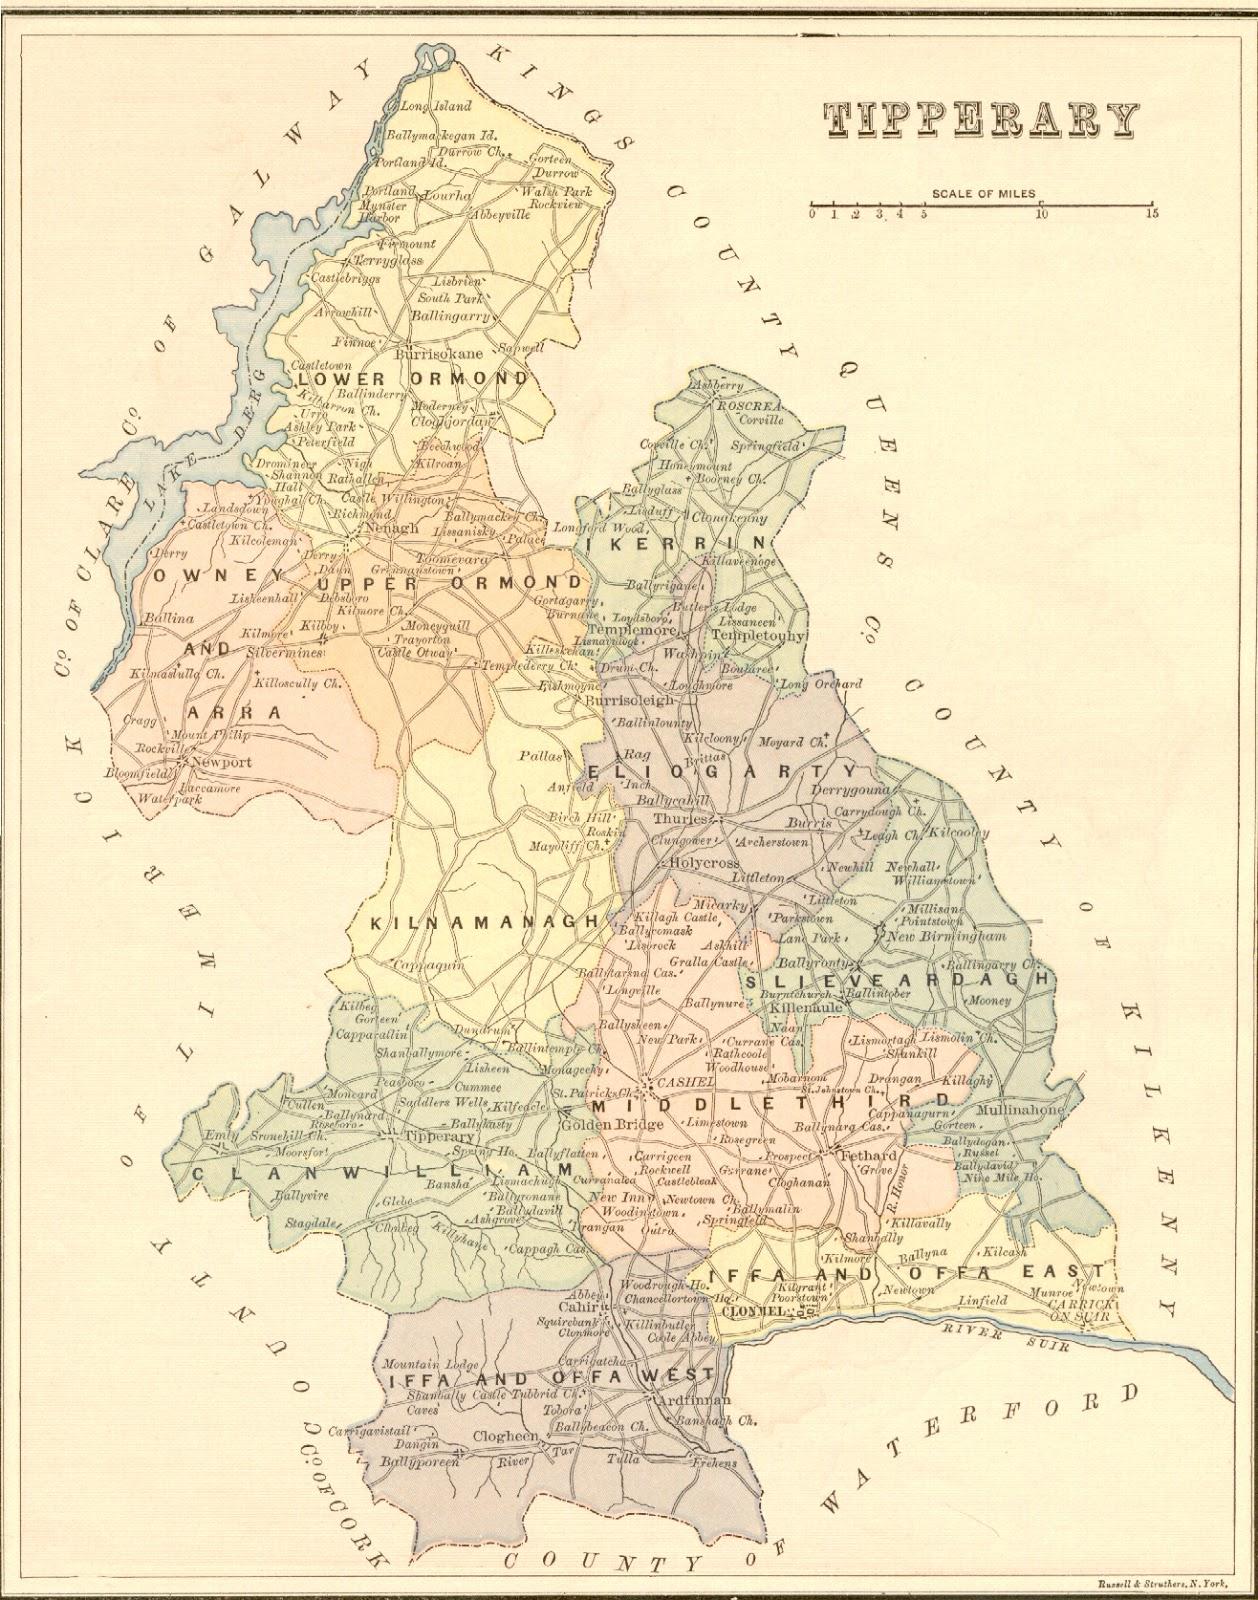 County Tipperary Ireland Map.Tobin Family History Stephen Tobin Ch 2 Tobins Driscolls In